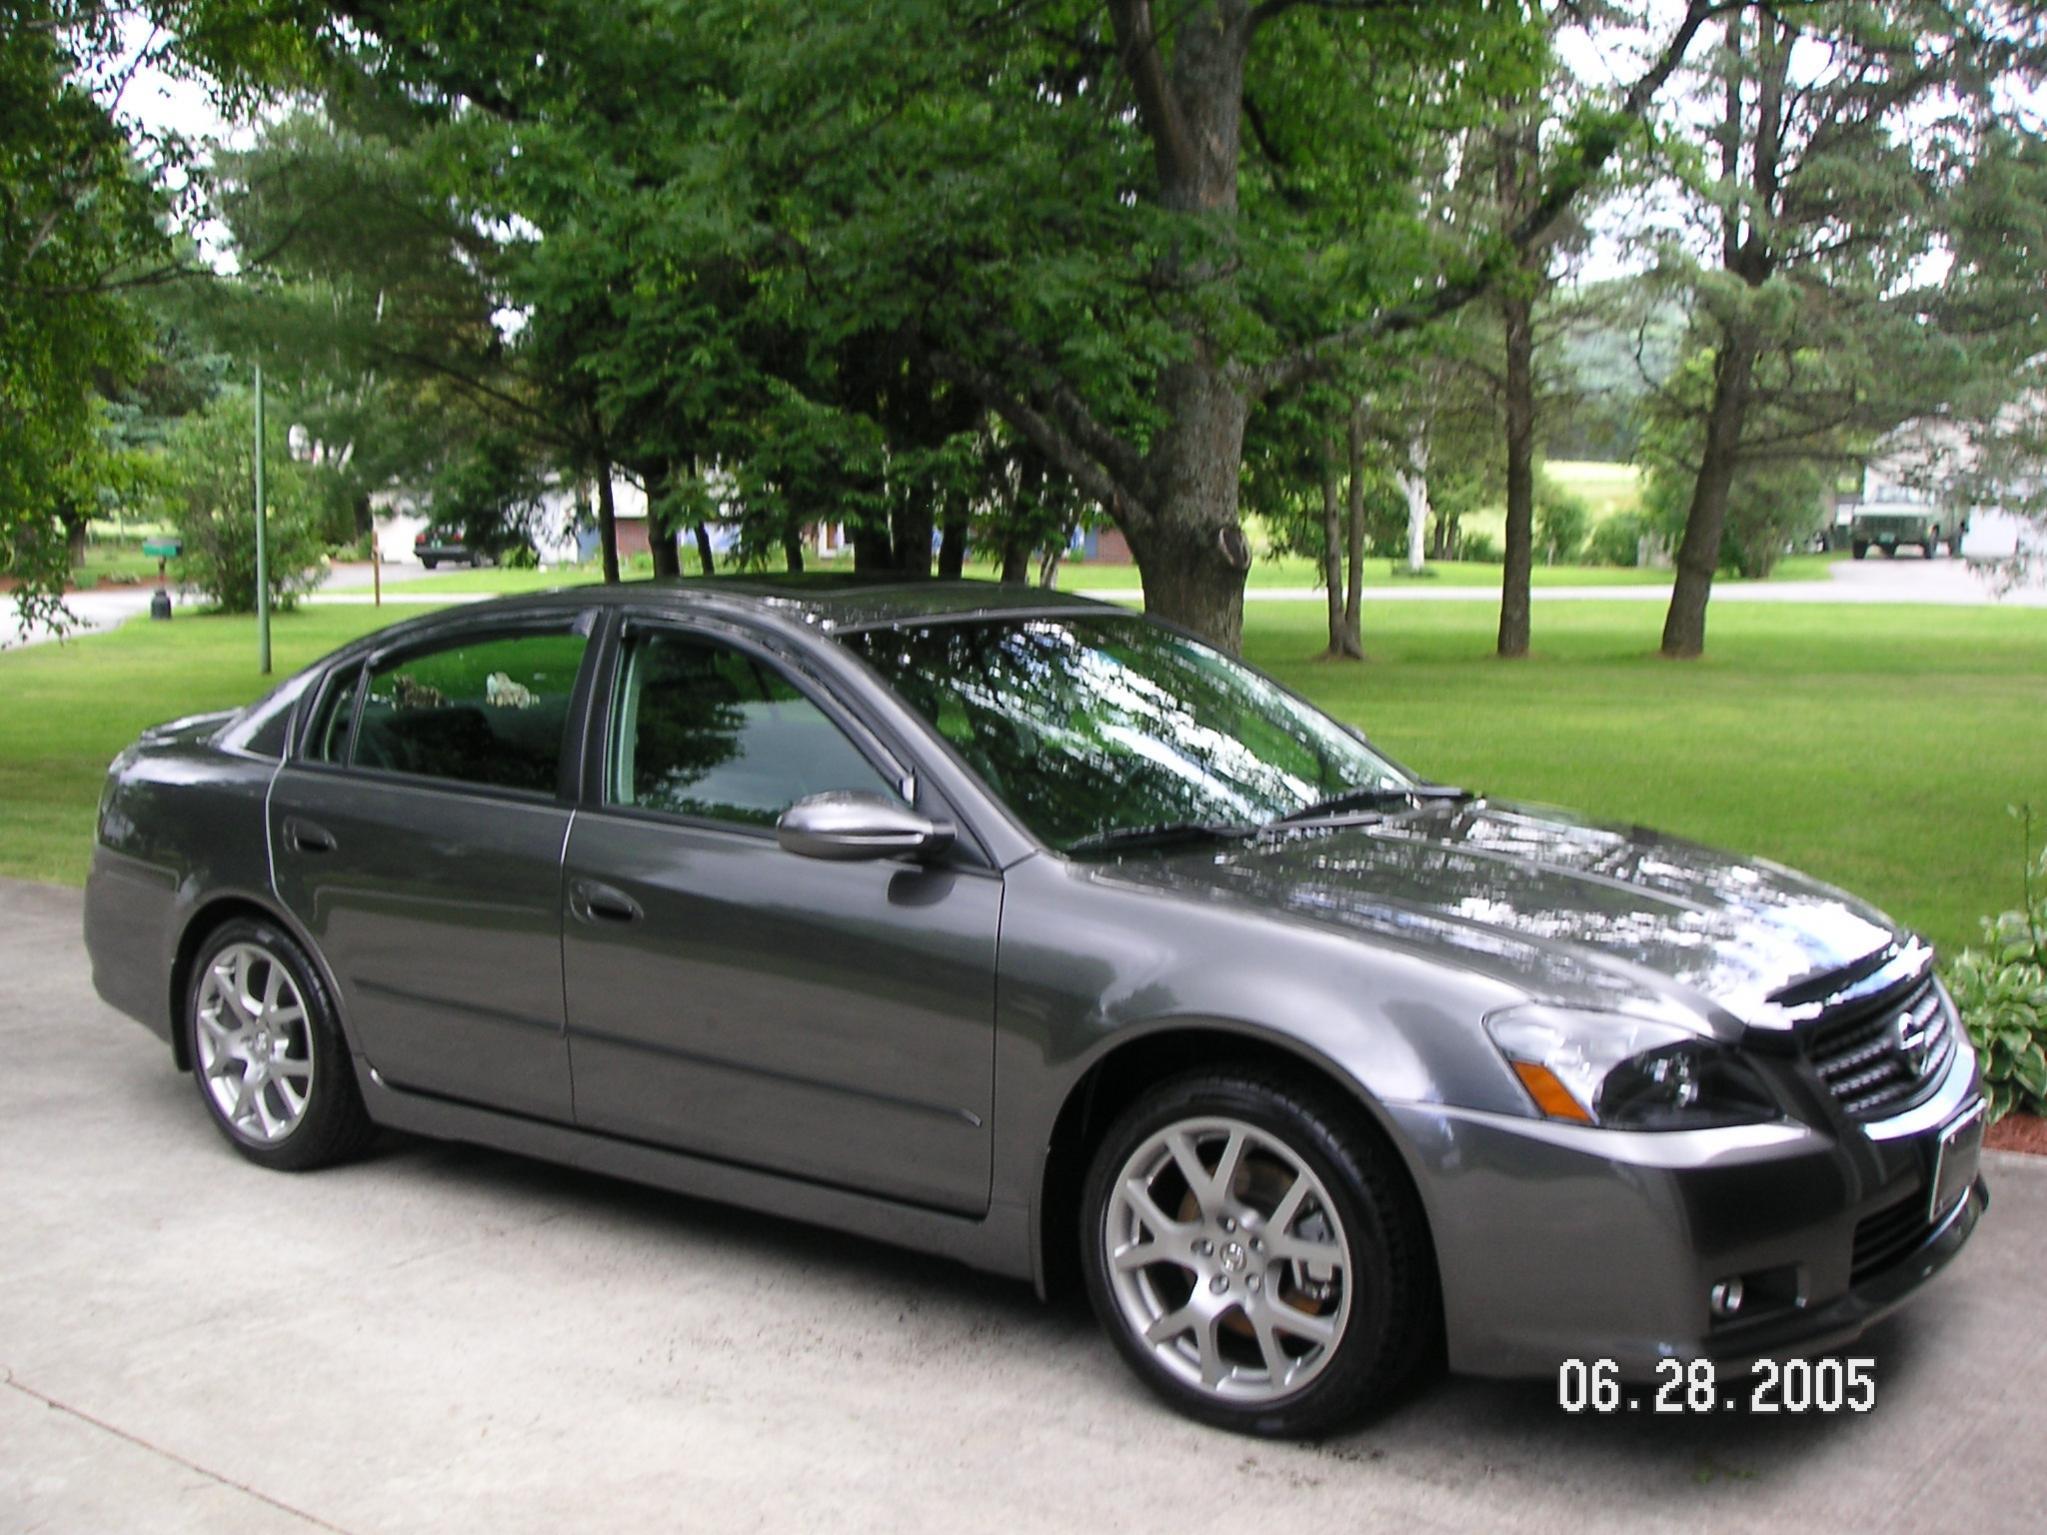 2005 Nissan Altima Image 10